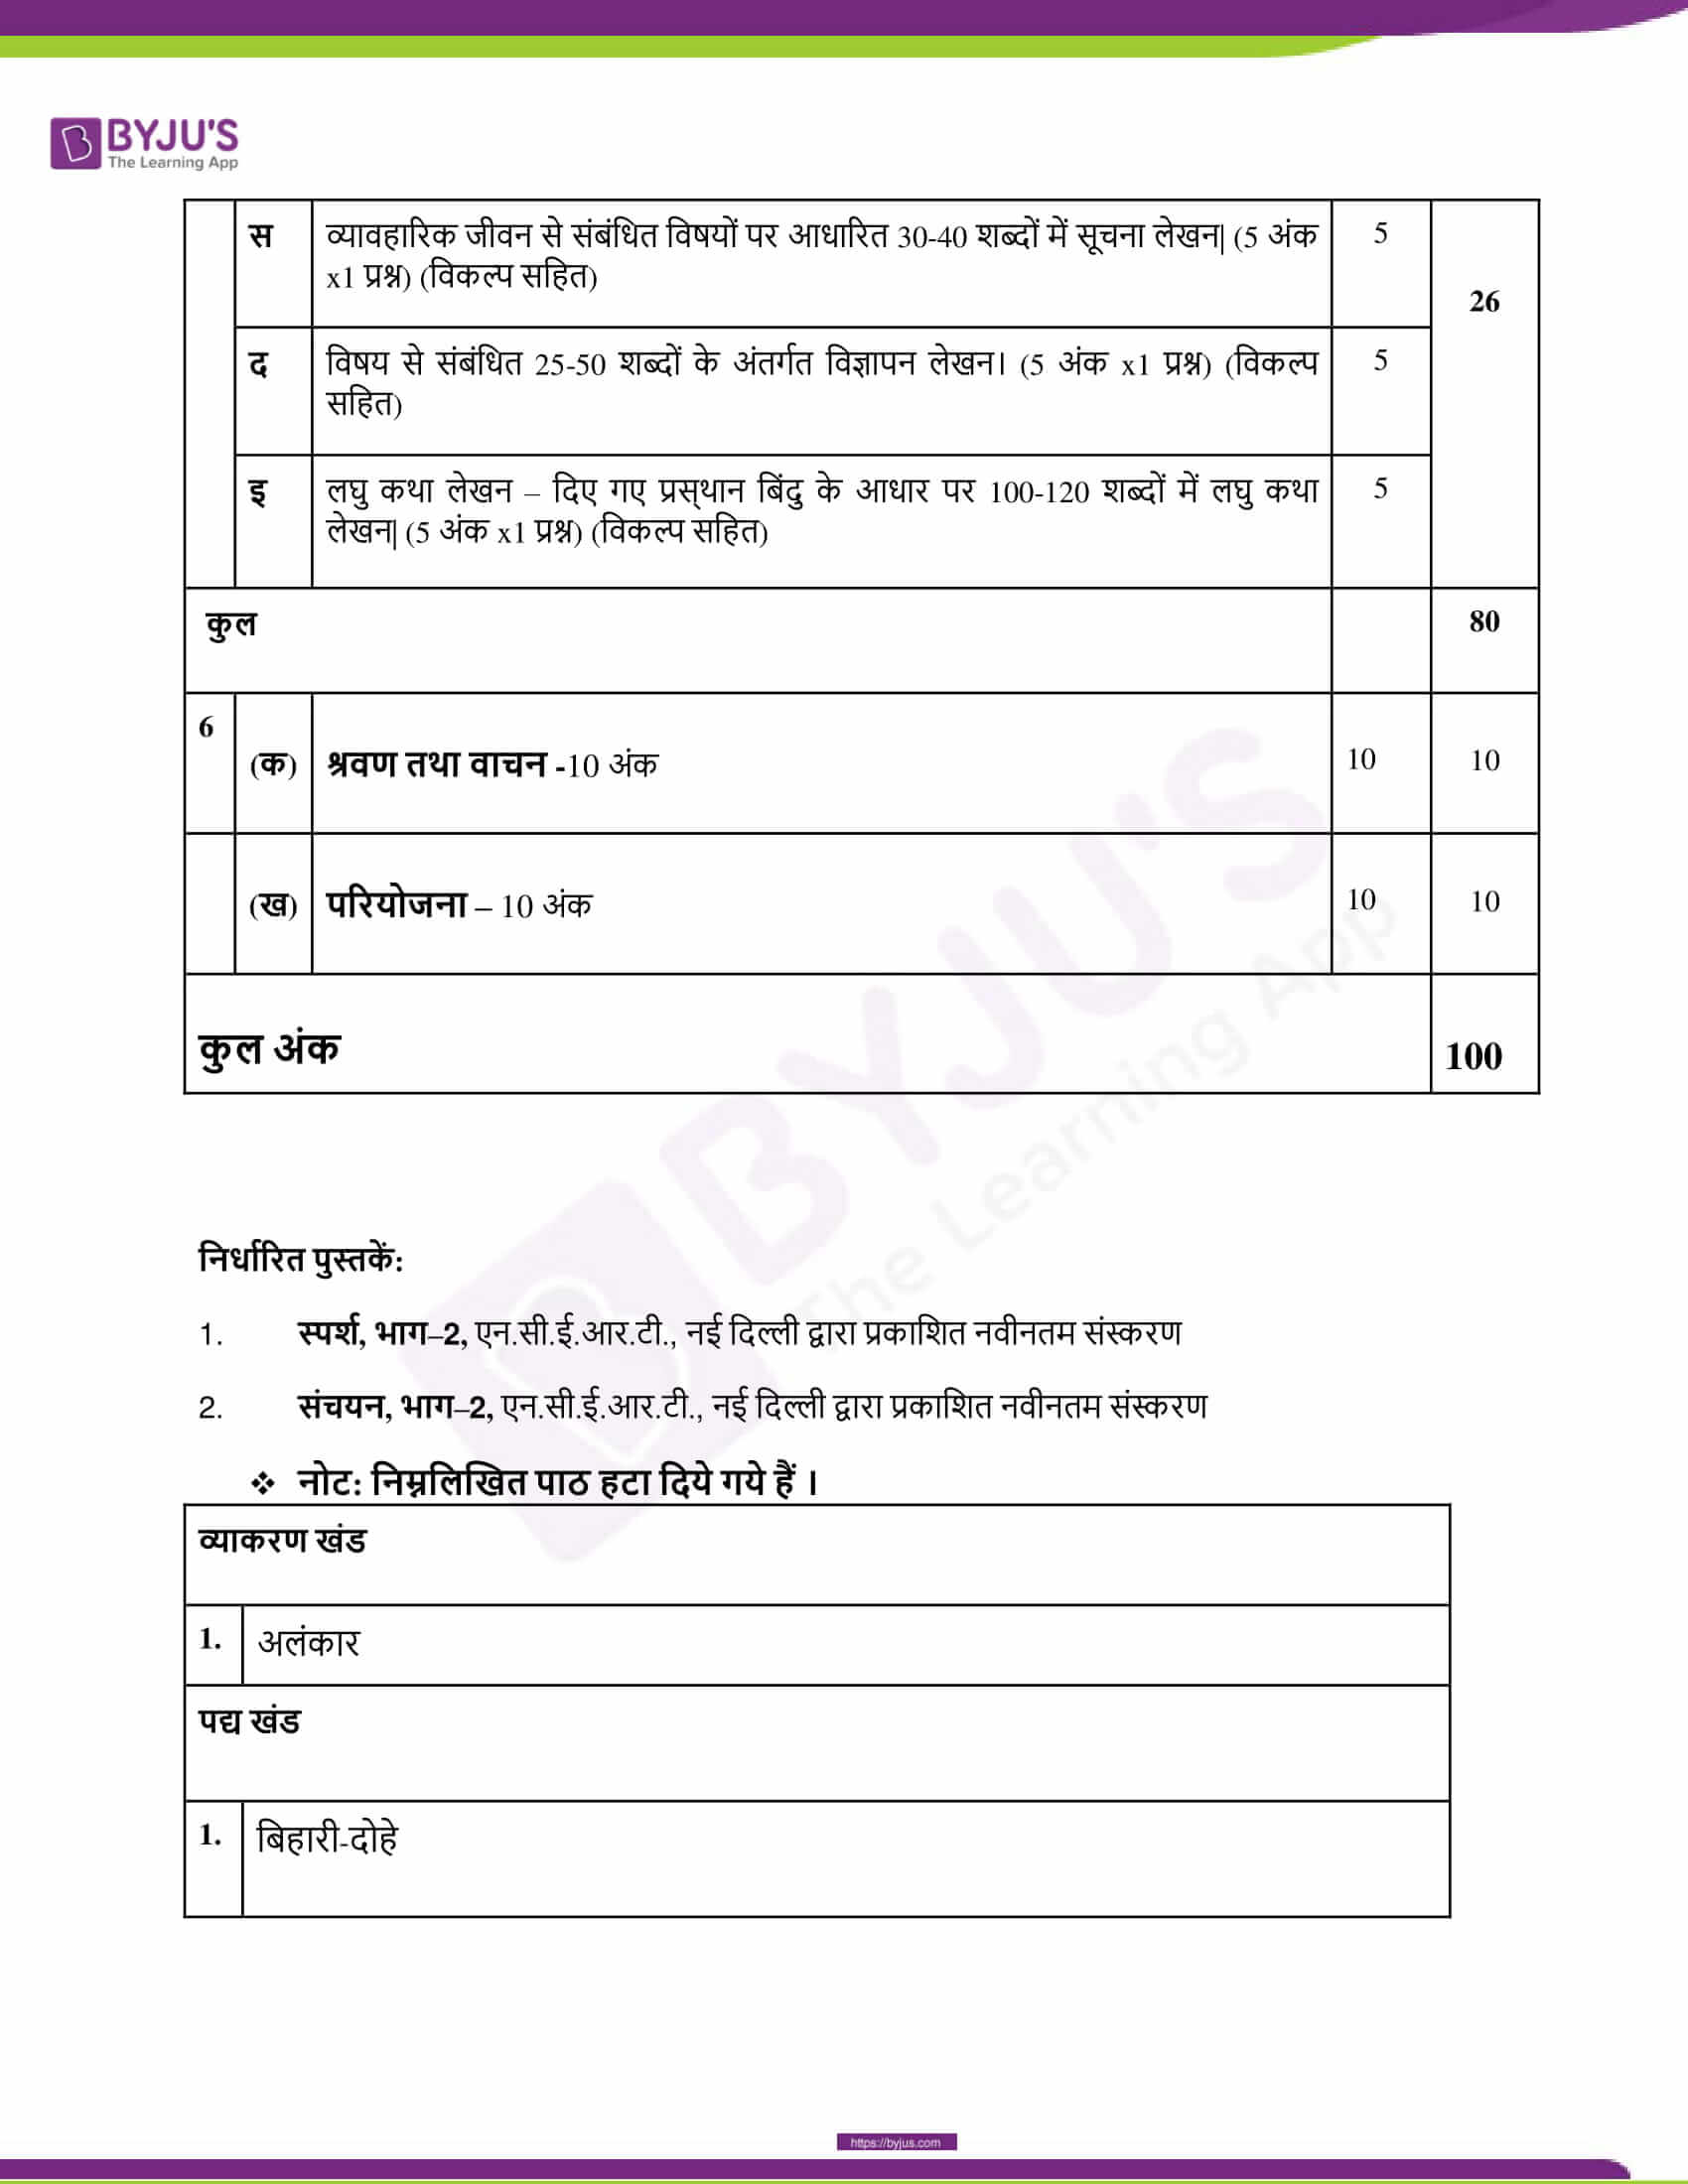 CBSE Class 10 Hindi Course B Revised Syllabus 2020 21 14